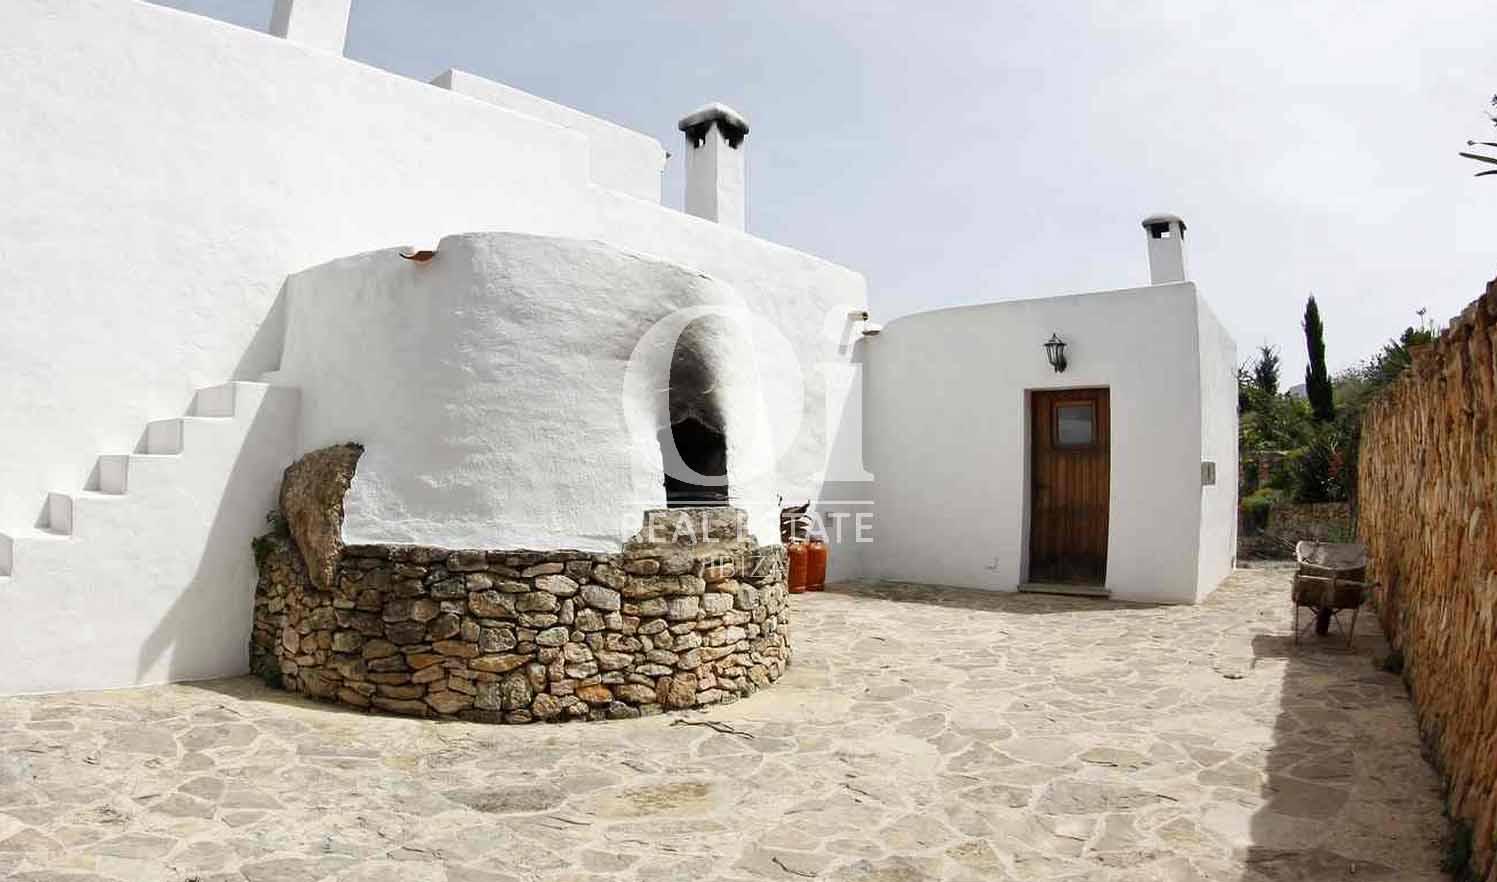 общий вид дома в краткосрочную аренду на Ибице